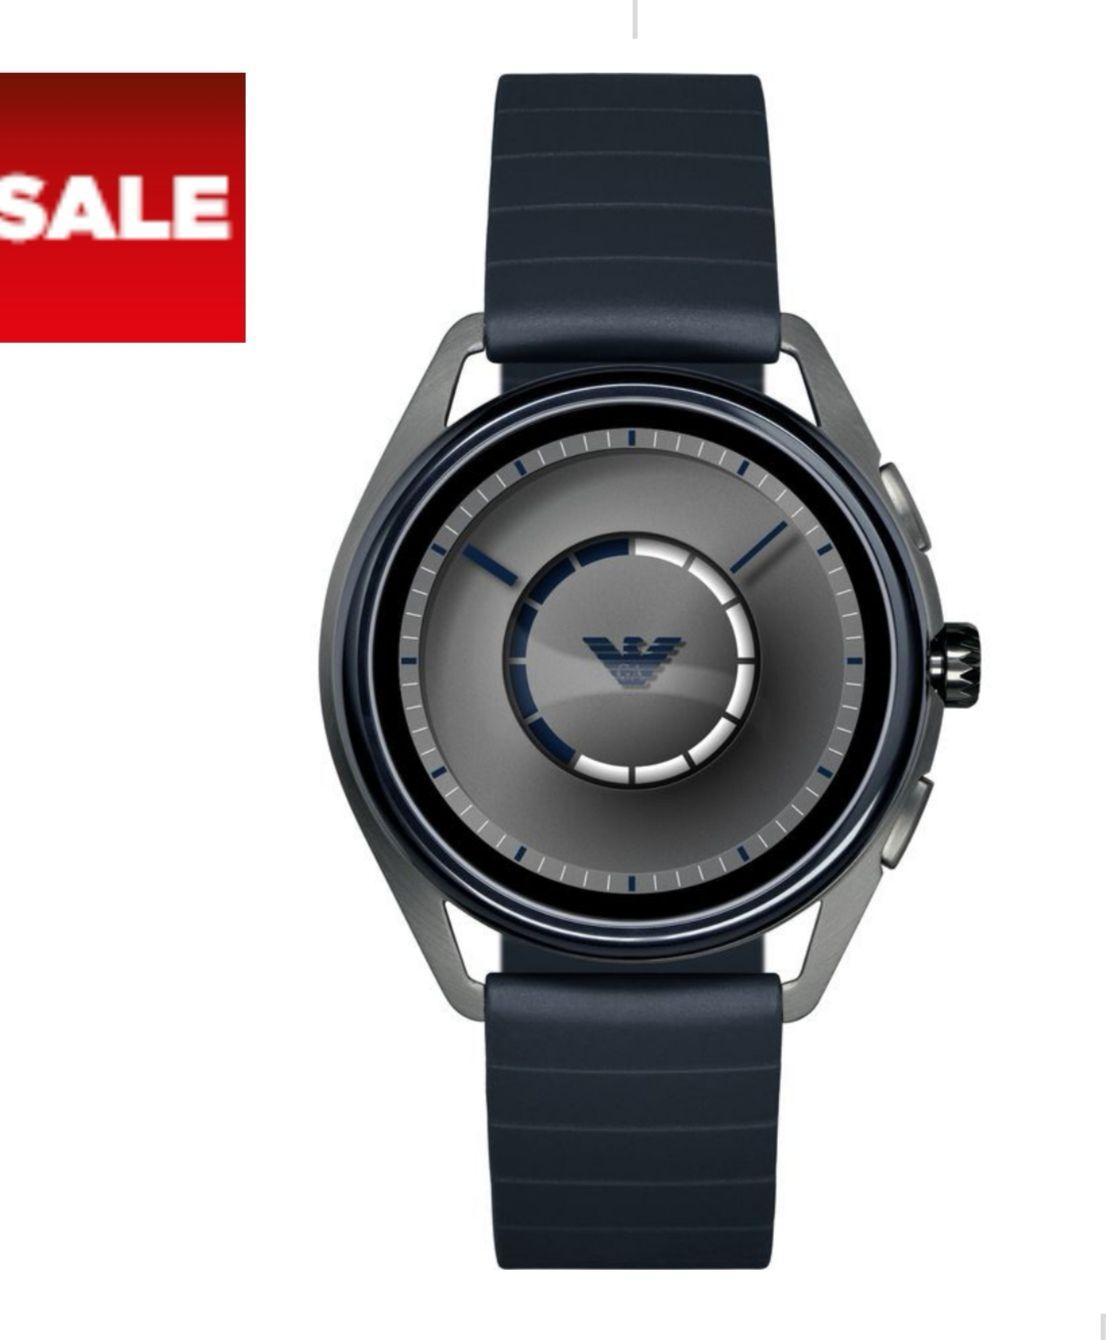 Emporio Armani smart watch ART5008 £199. Gunmetal & blue IOS/Android. Currys